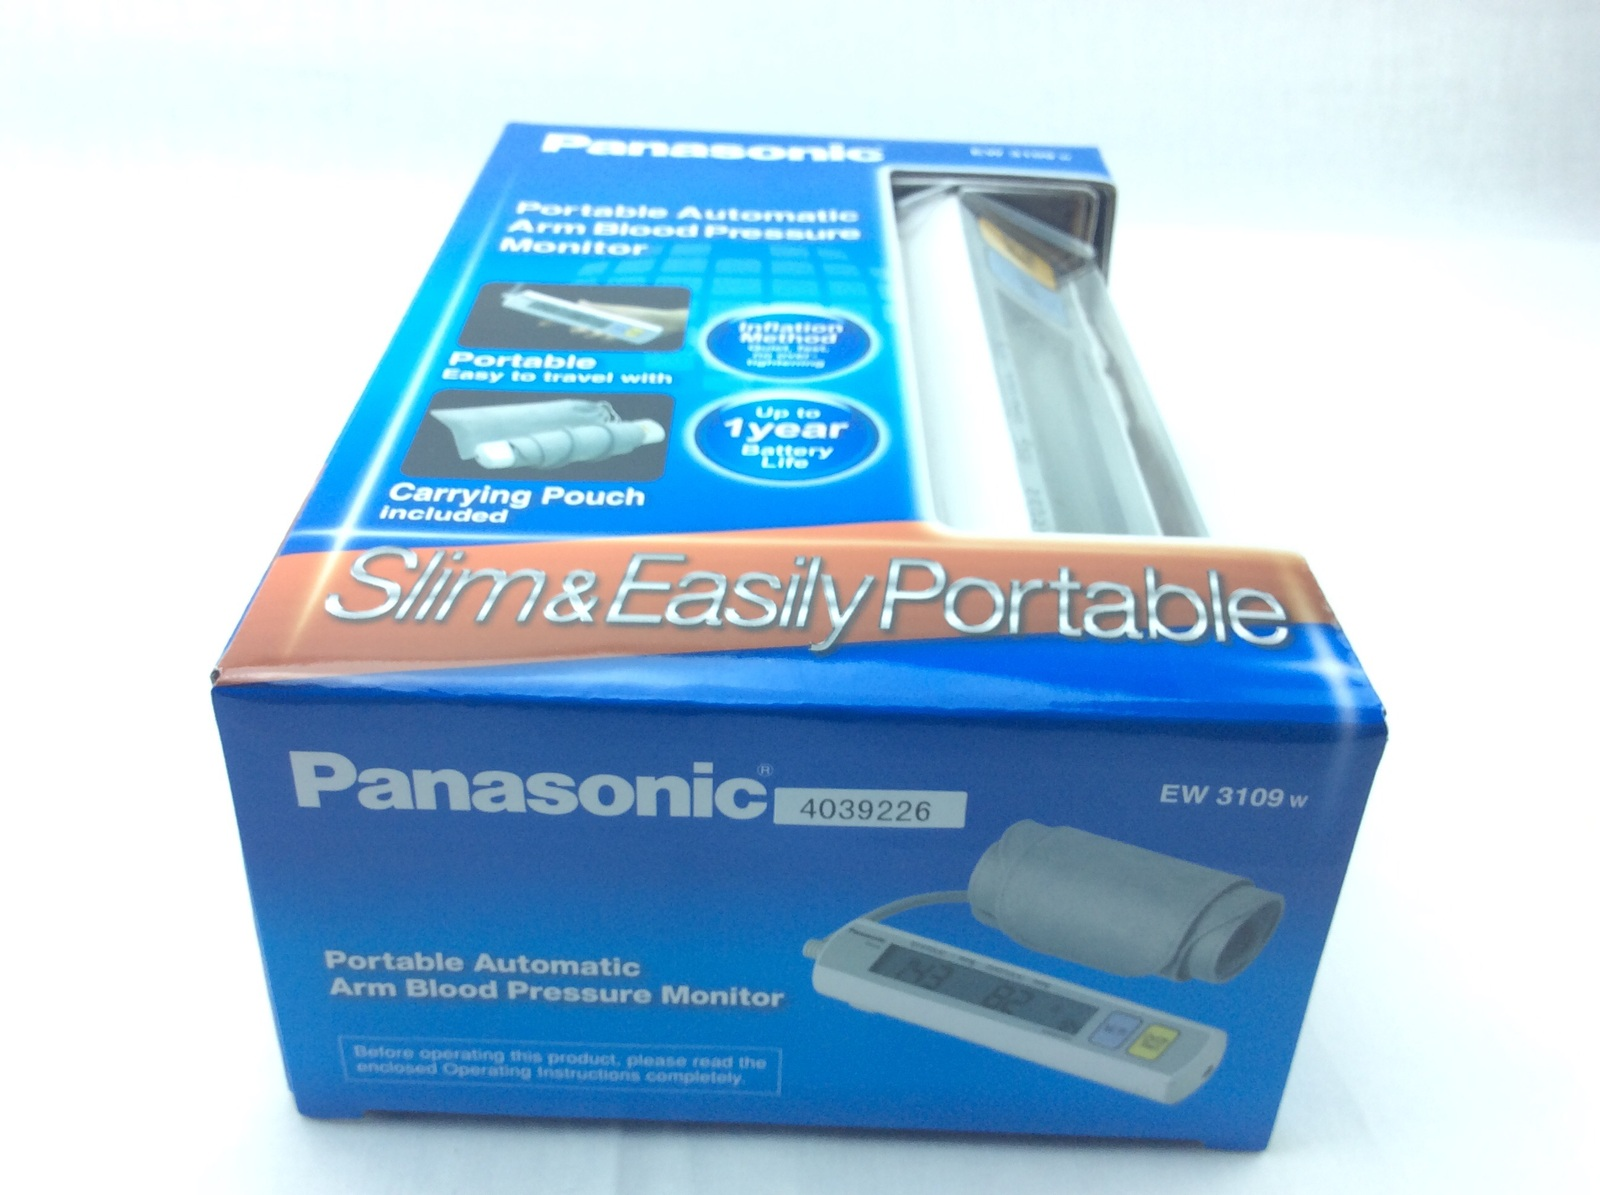 Panasonic EW3109W Portable Upper Arm Blood Pressure Monitor White/Grey